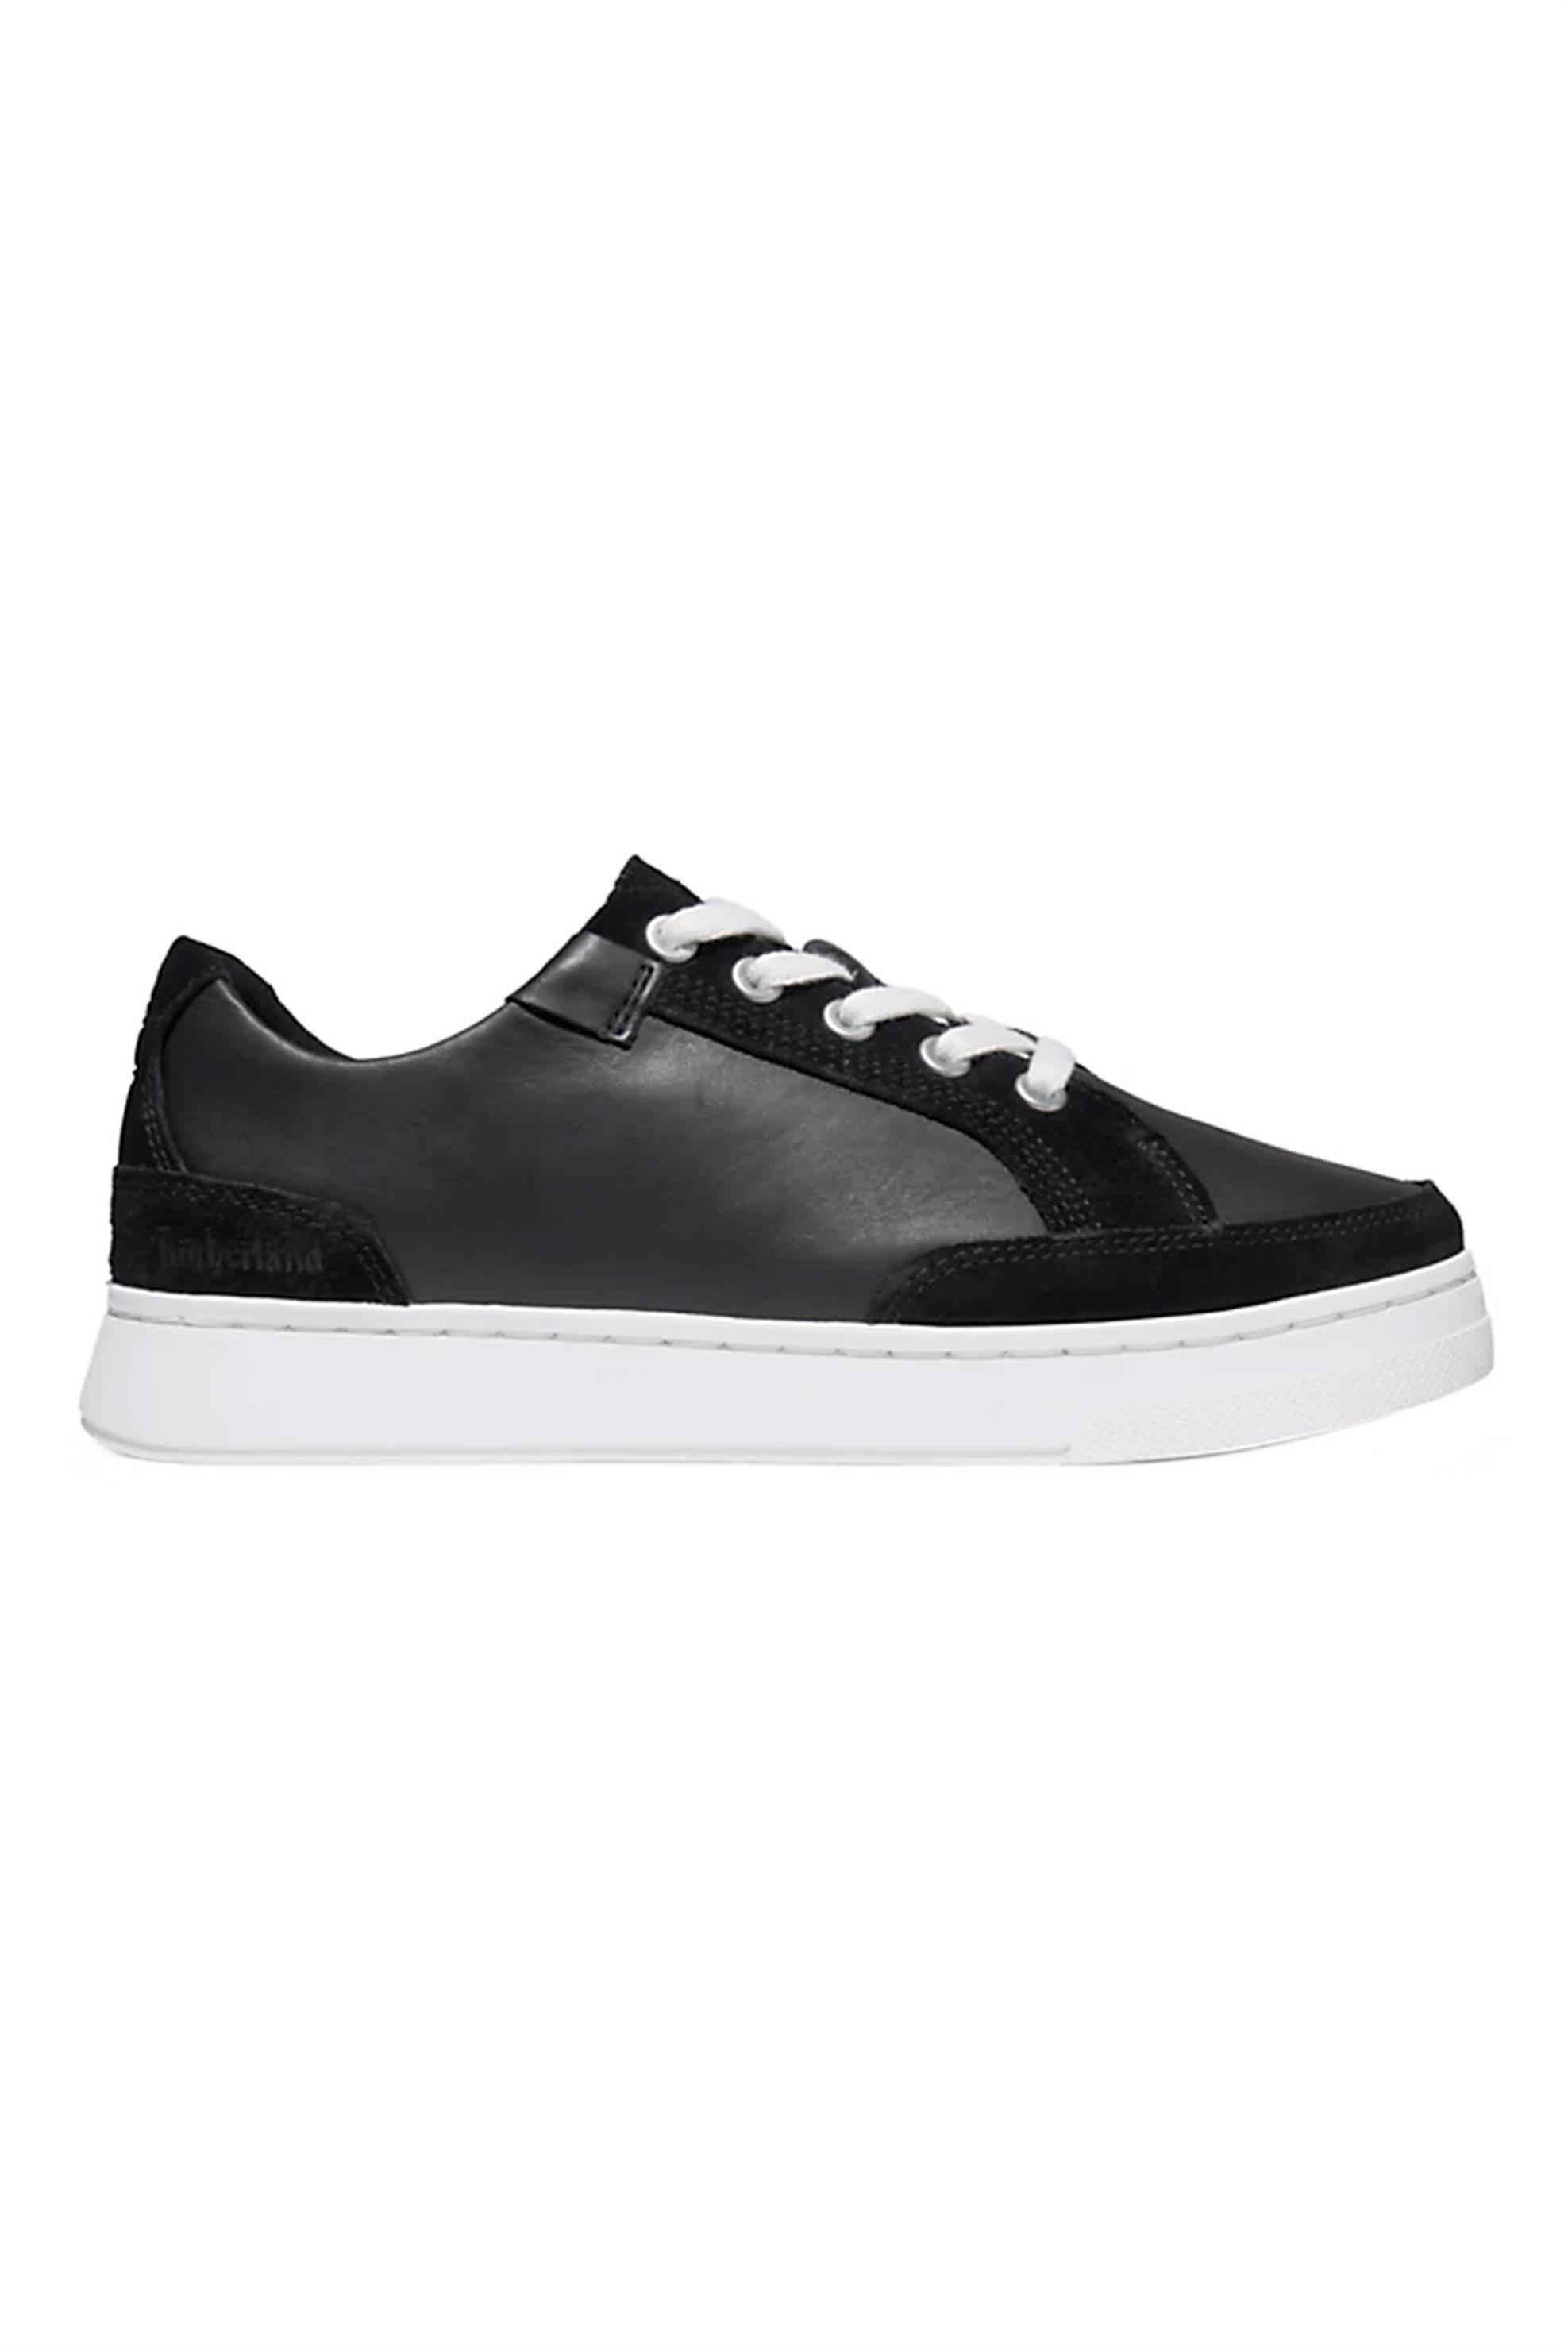 "Timberland γυναικεία sneakers με suede λεπτομέρειες ""Αtlanta Green"" – TB0A23QC0151 – Μαύρο"